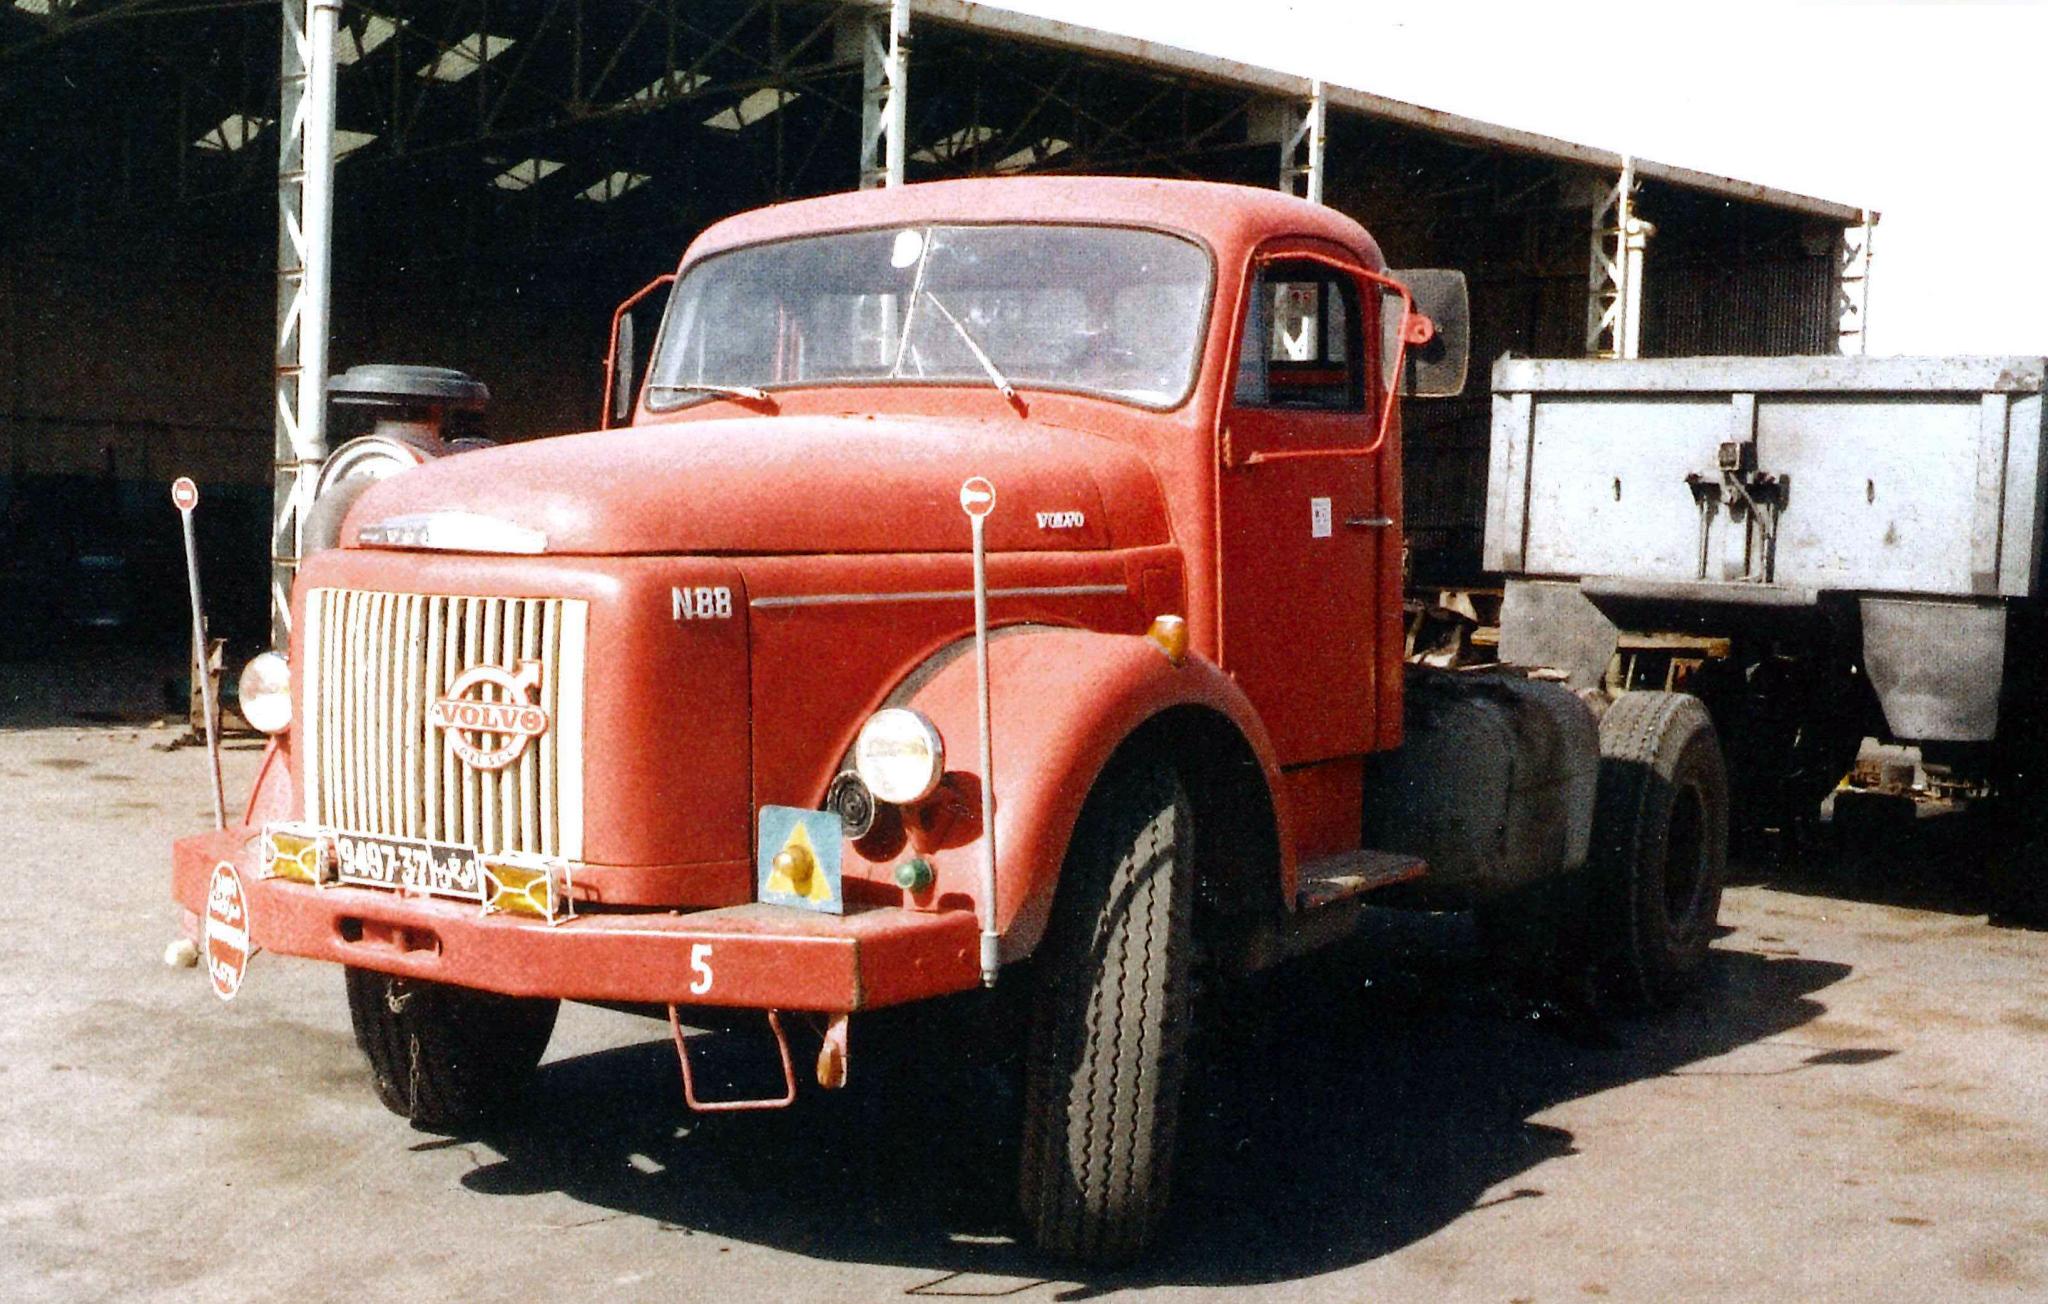 Transport Routier au Maroc - Histoire 49779999332_373f08631f_o_d